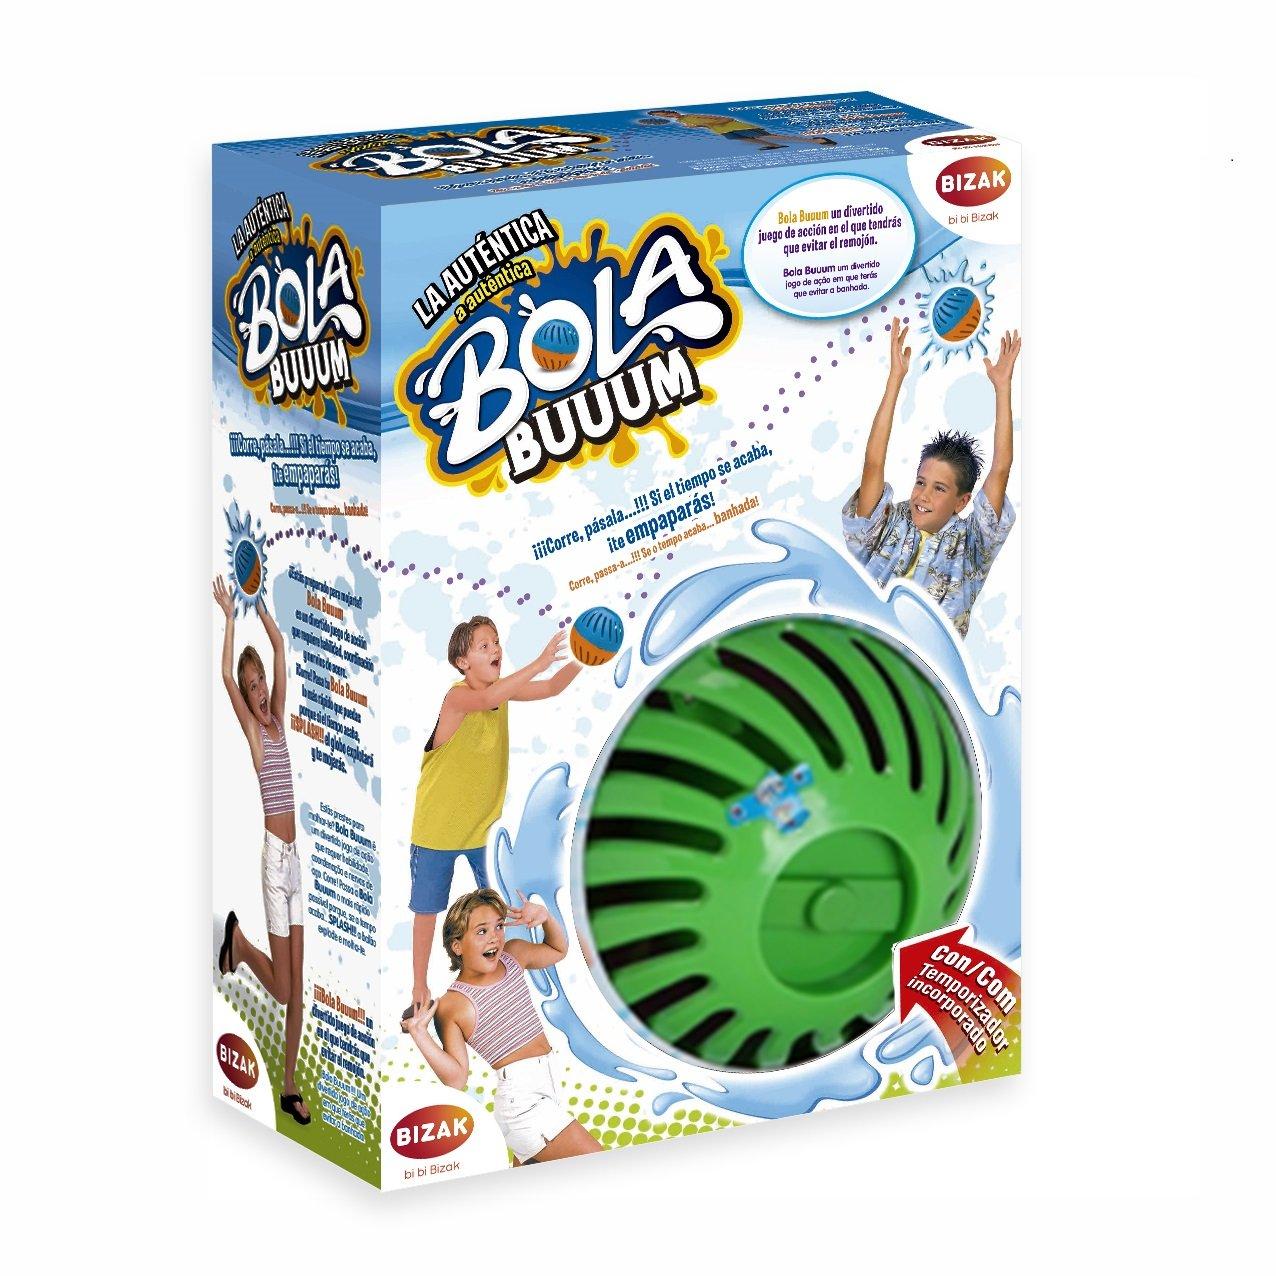 Bizak Aire Libre Bola Buuum (BIZAK 35007532): Amazon.es: Juguetes ...